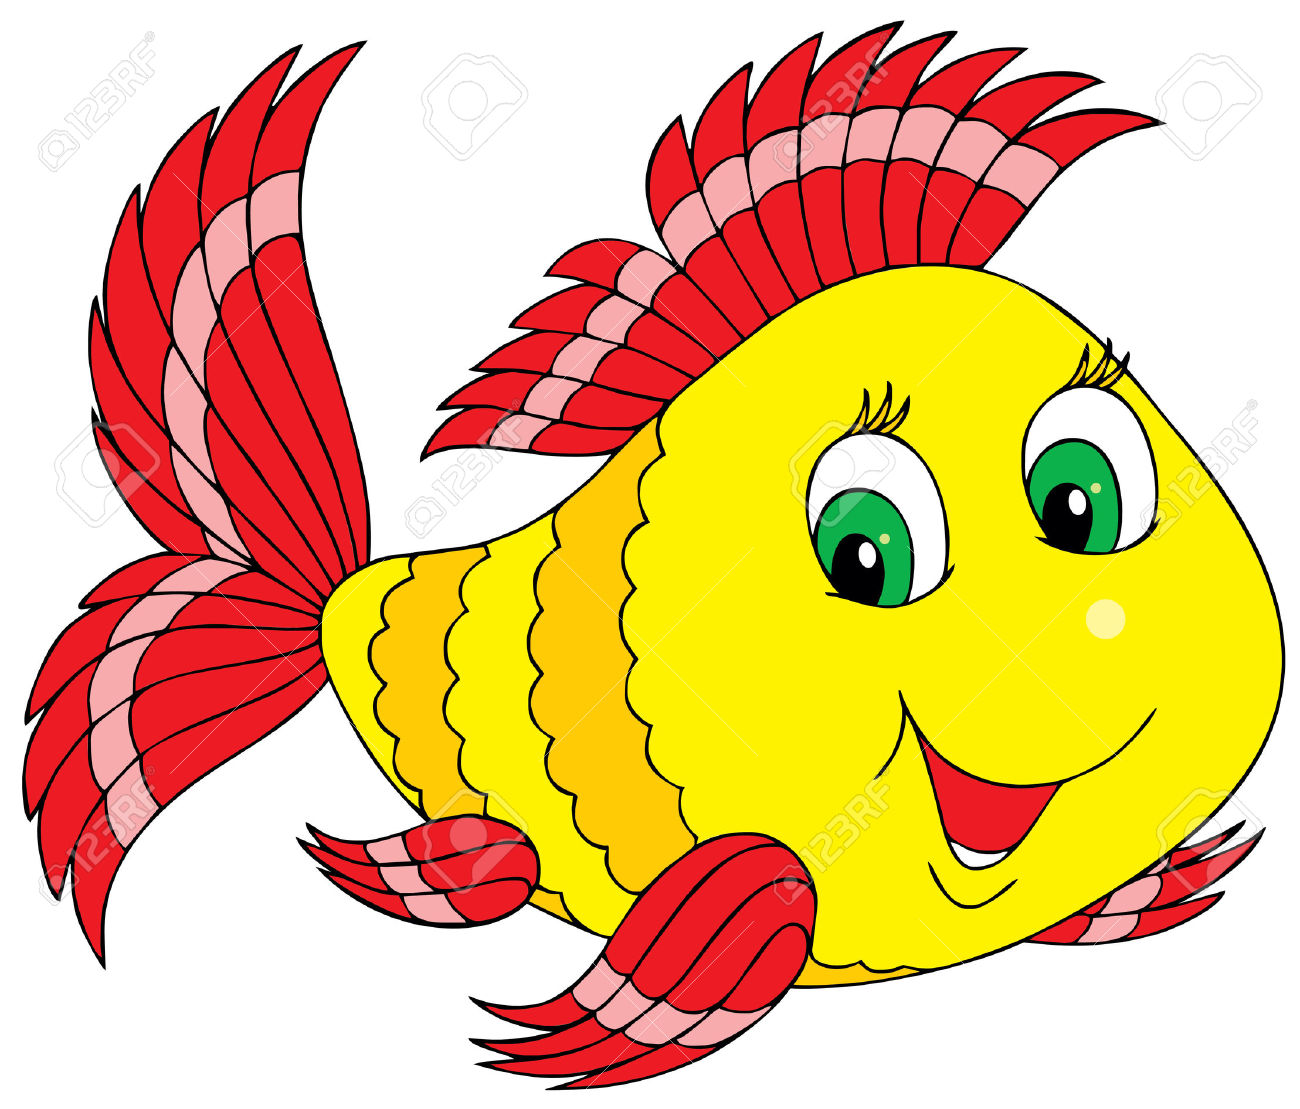 Blue Fish Fish Clip Art Free-Blue fish fish clip art free-1